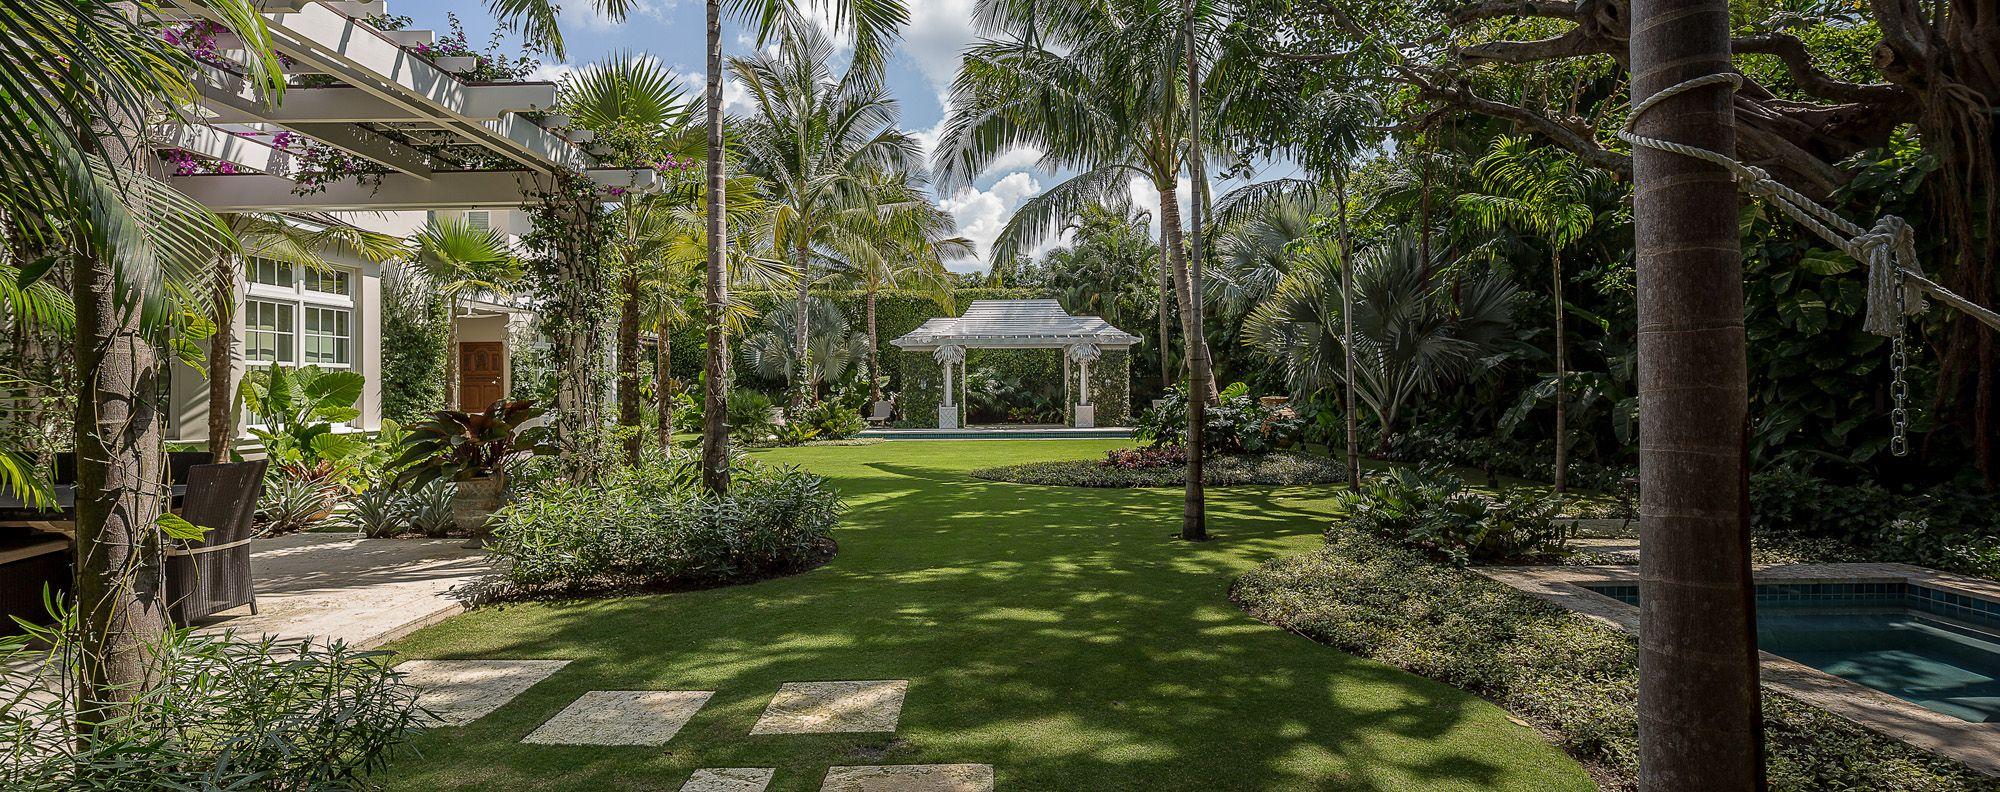 Million-Dollar Gardens & Shark Tank Guest Houses | Garden ...